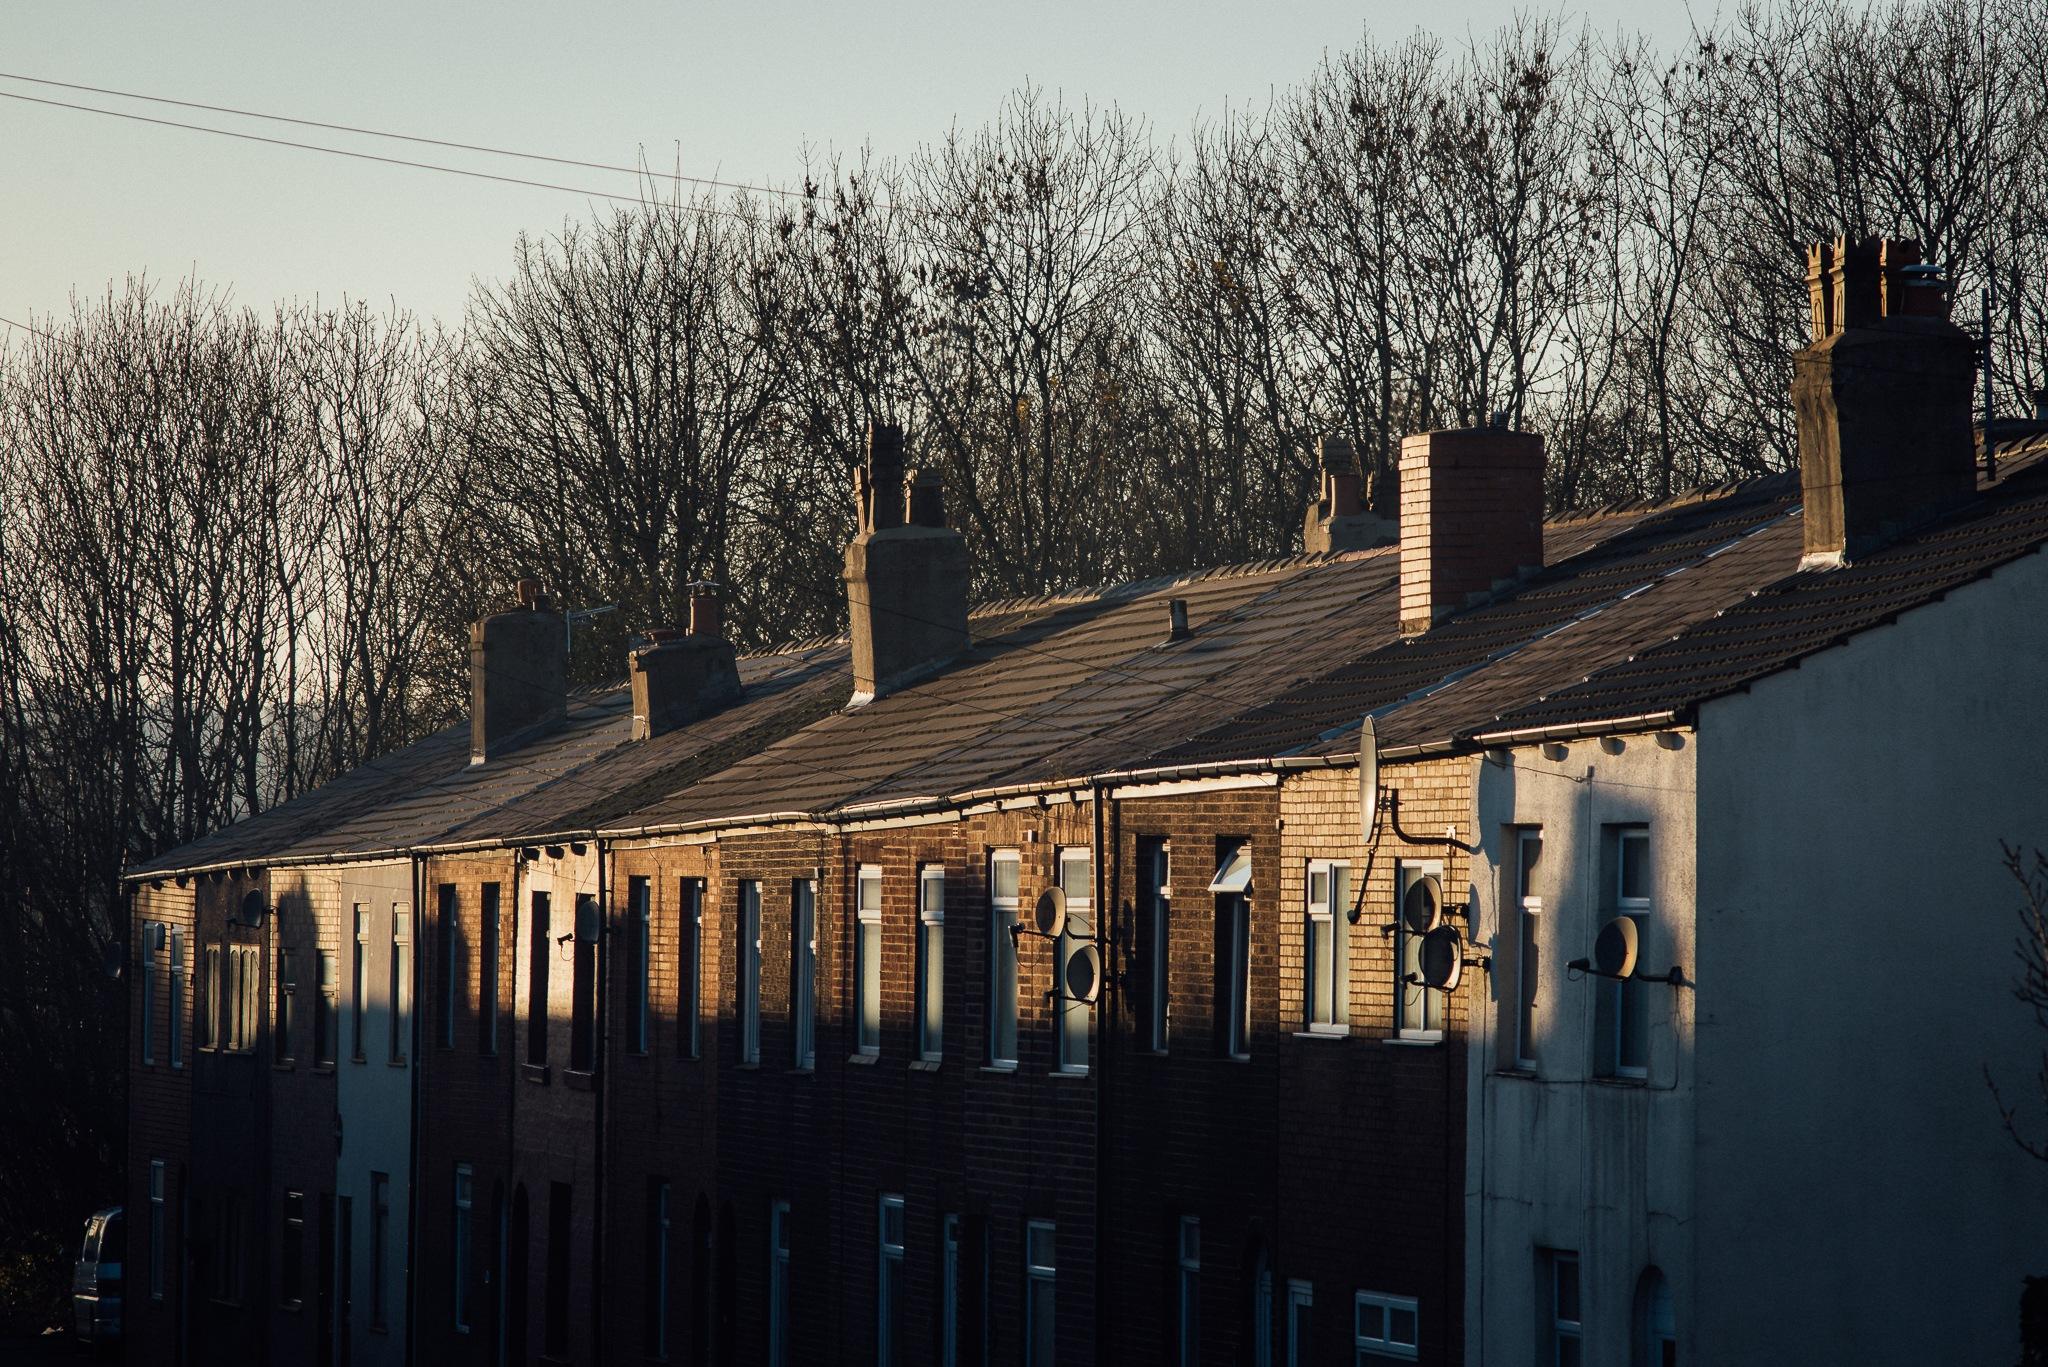 Terraced Houses (ii) by IWCharters